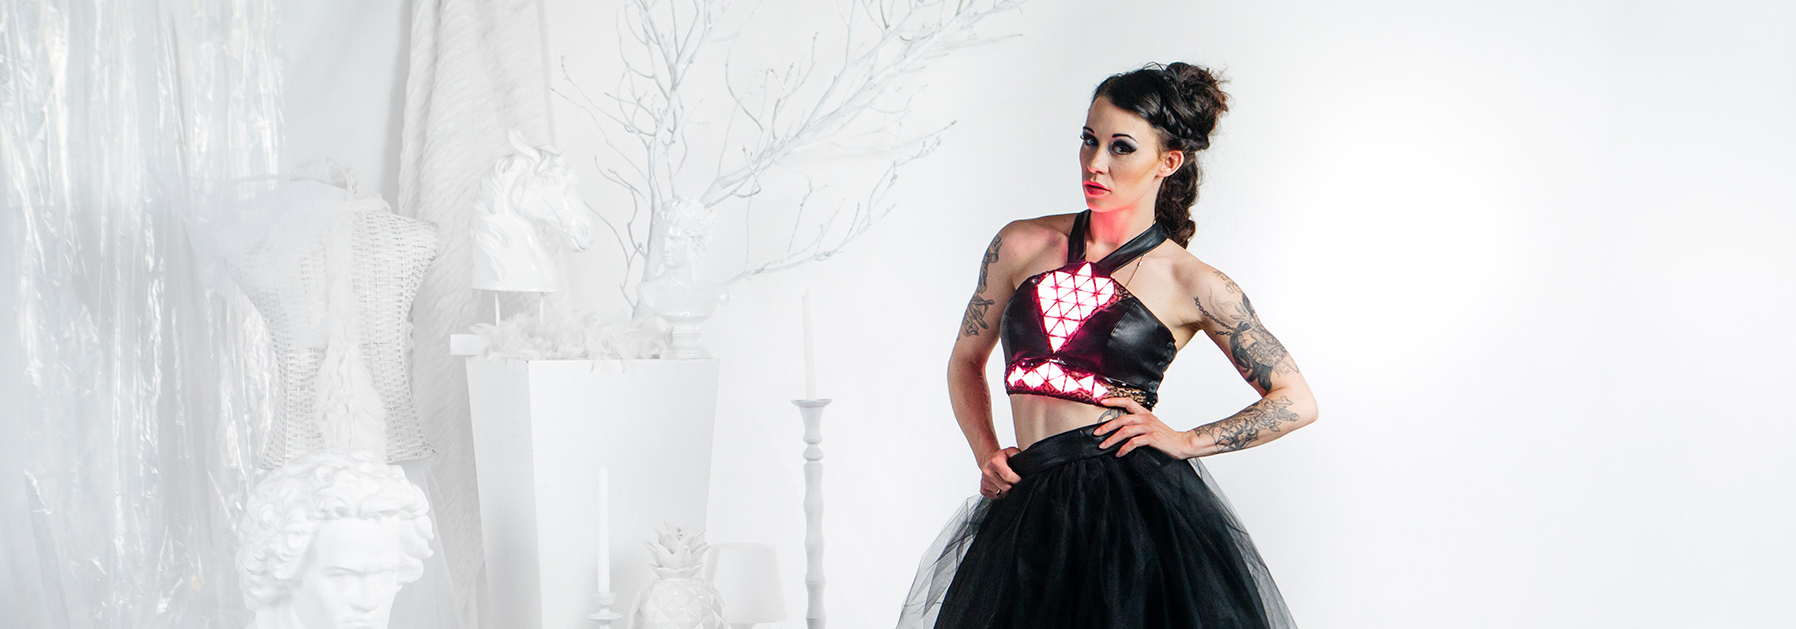 makefashion_wearabletech_fashion_180033